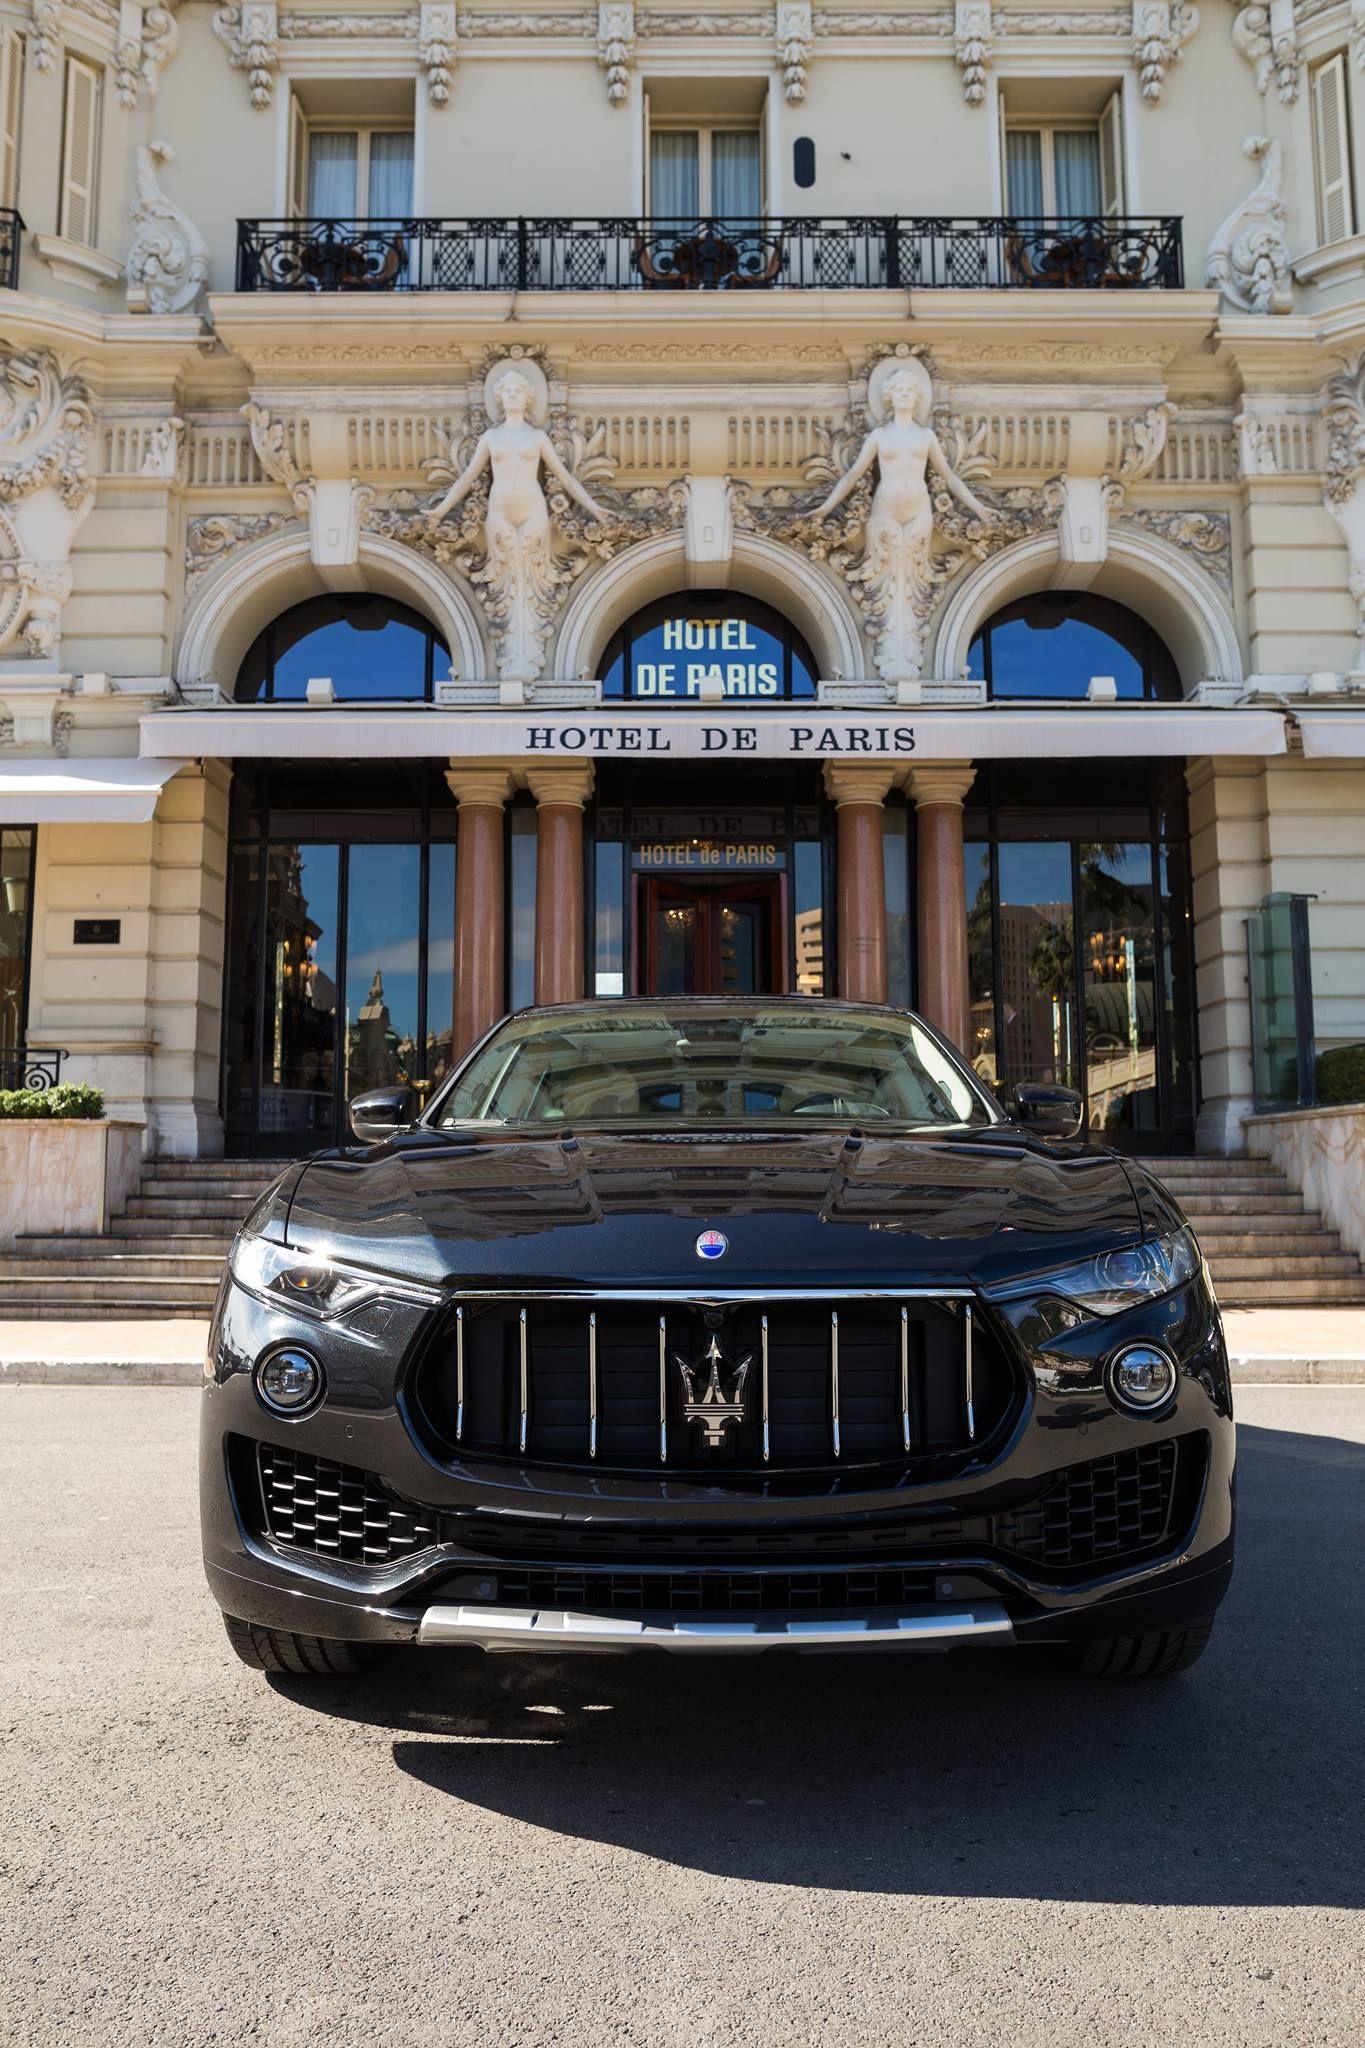 Monte Carlo Monaco Luxury Cars Dream Cars Sports Cars Luxury